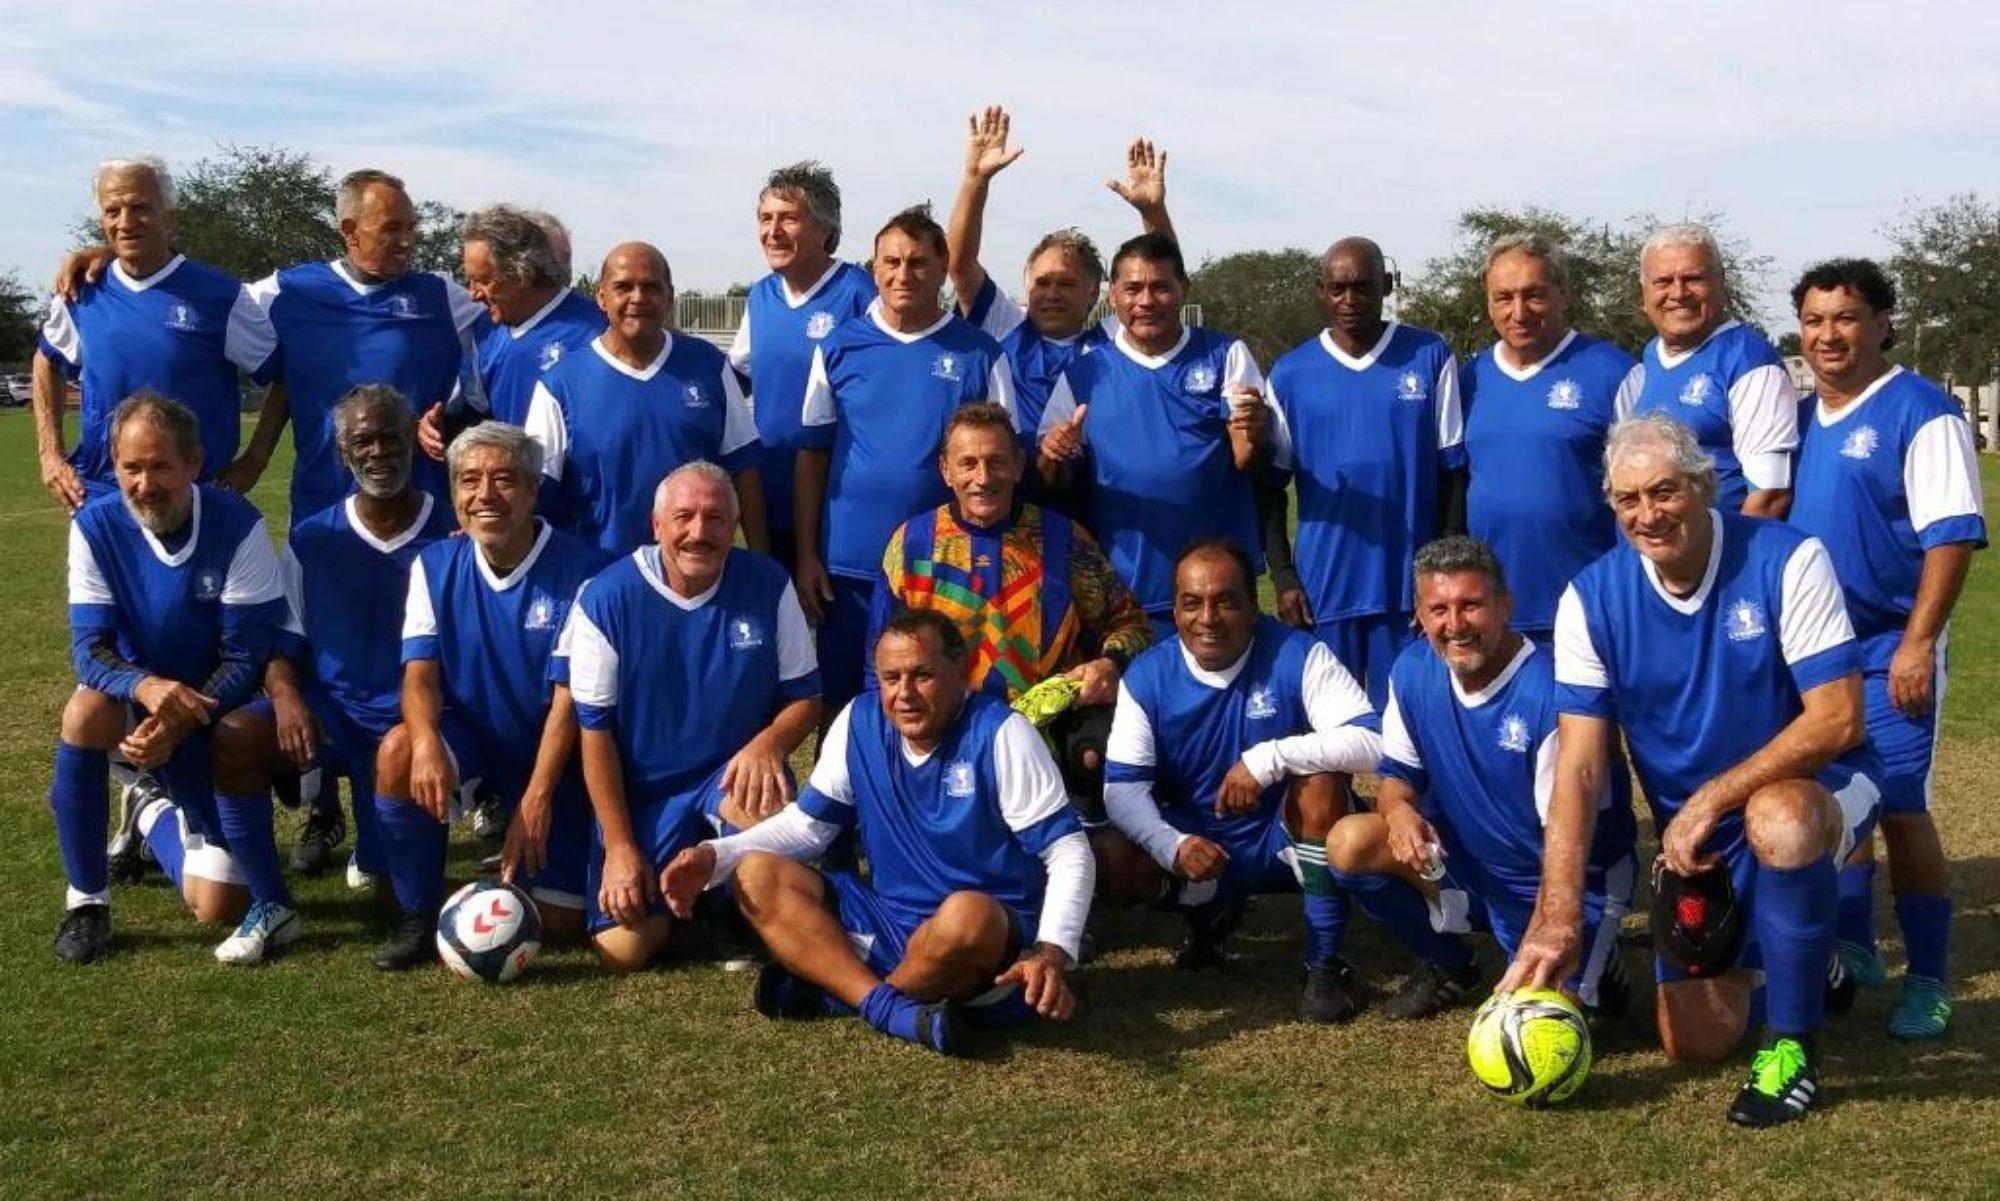 Last Dream Soccer